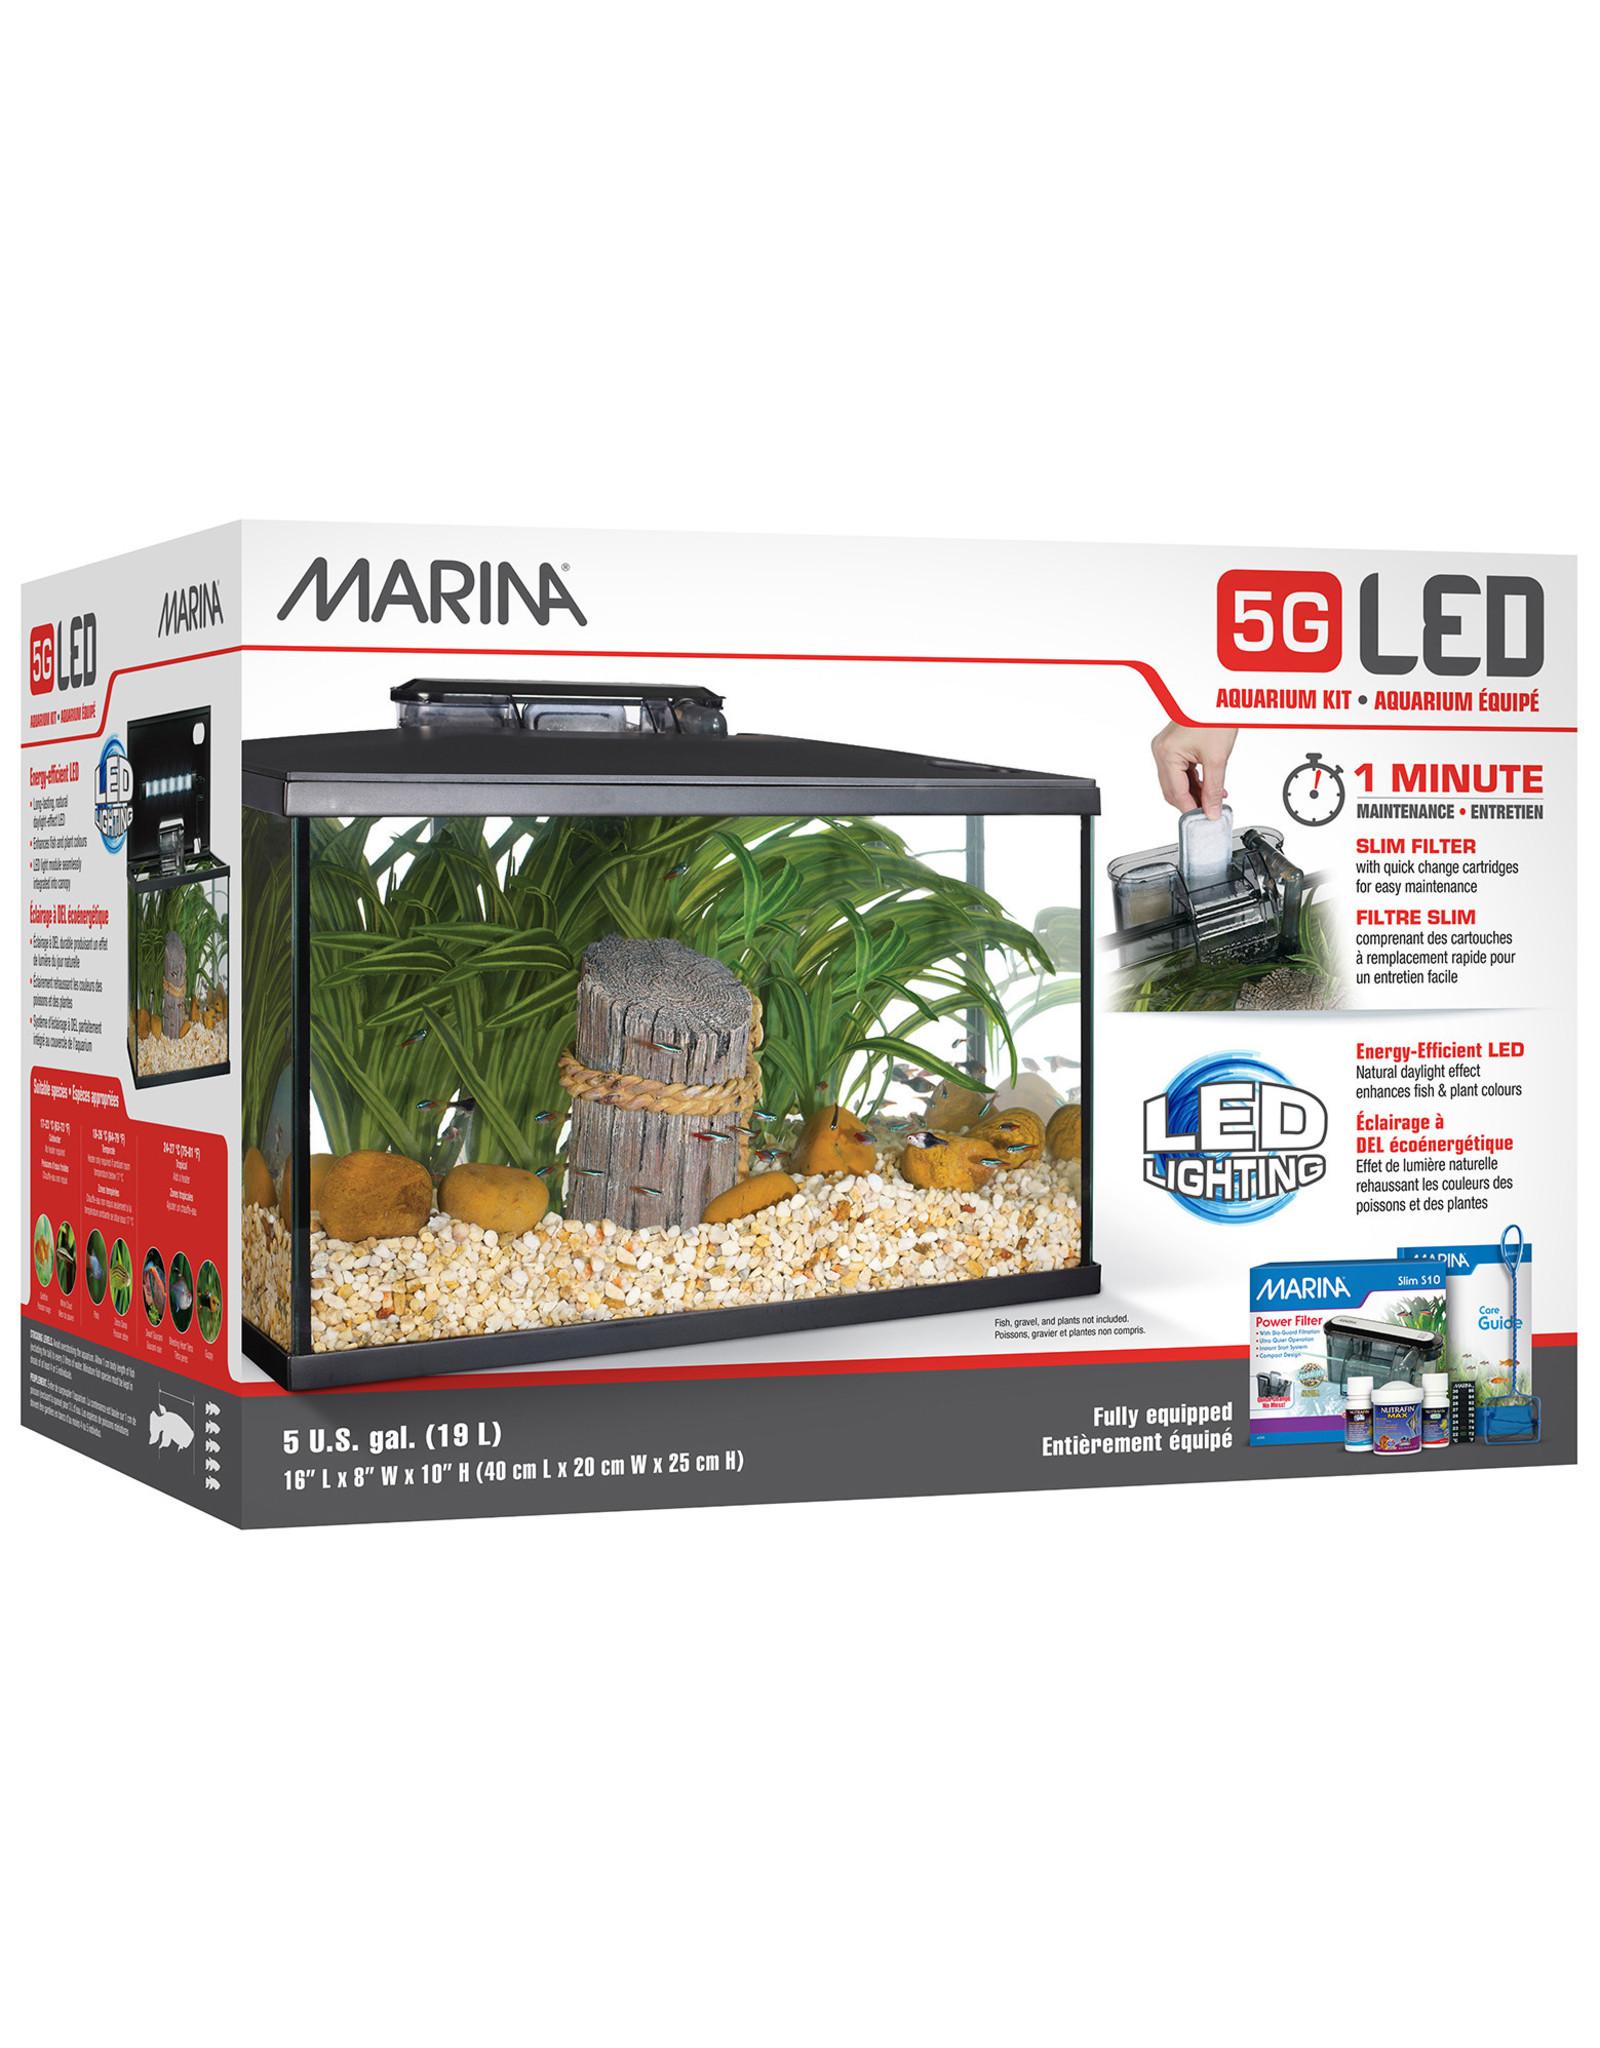 Marina Marina 5G (5 Gal.) LED Aquarium Kit